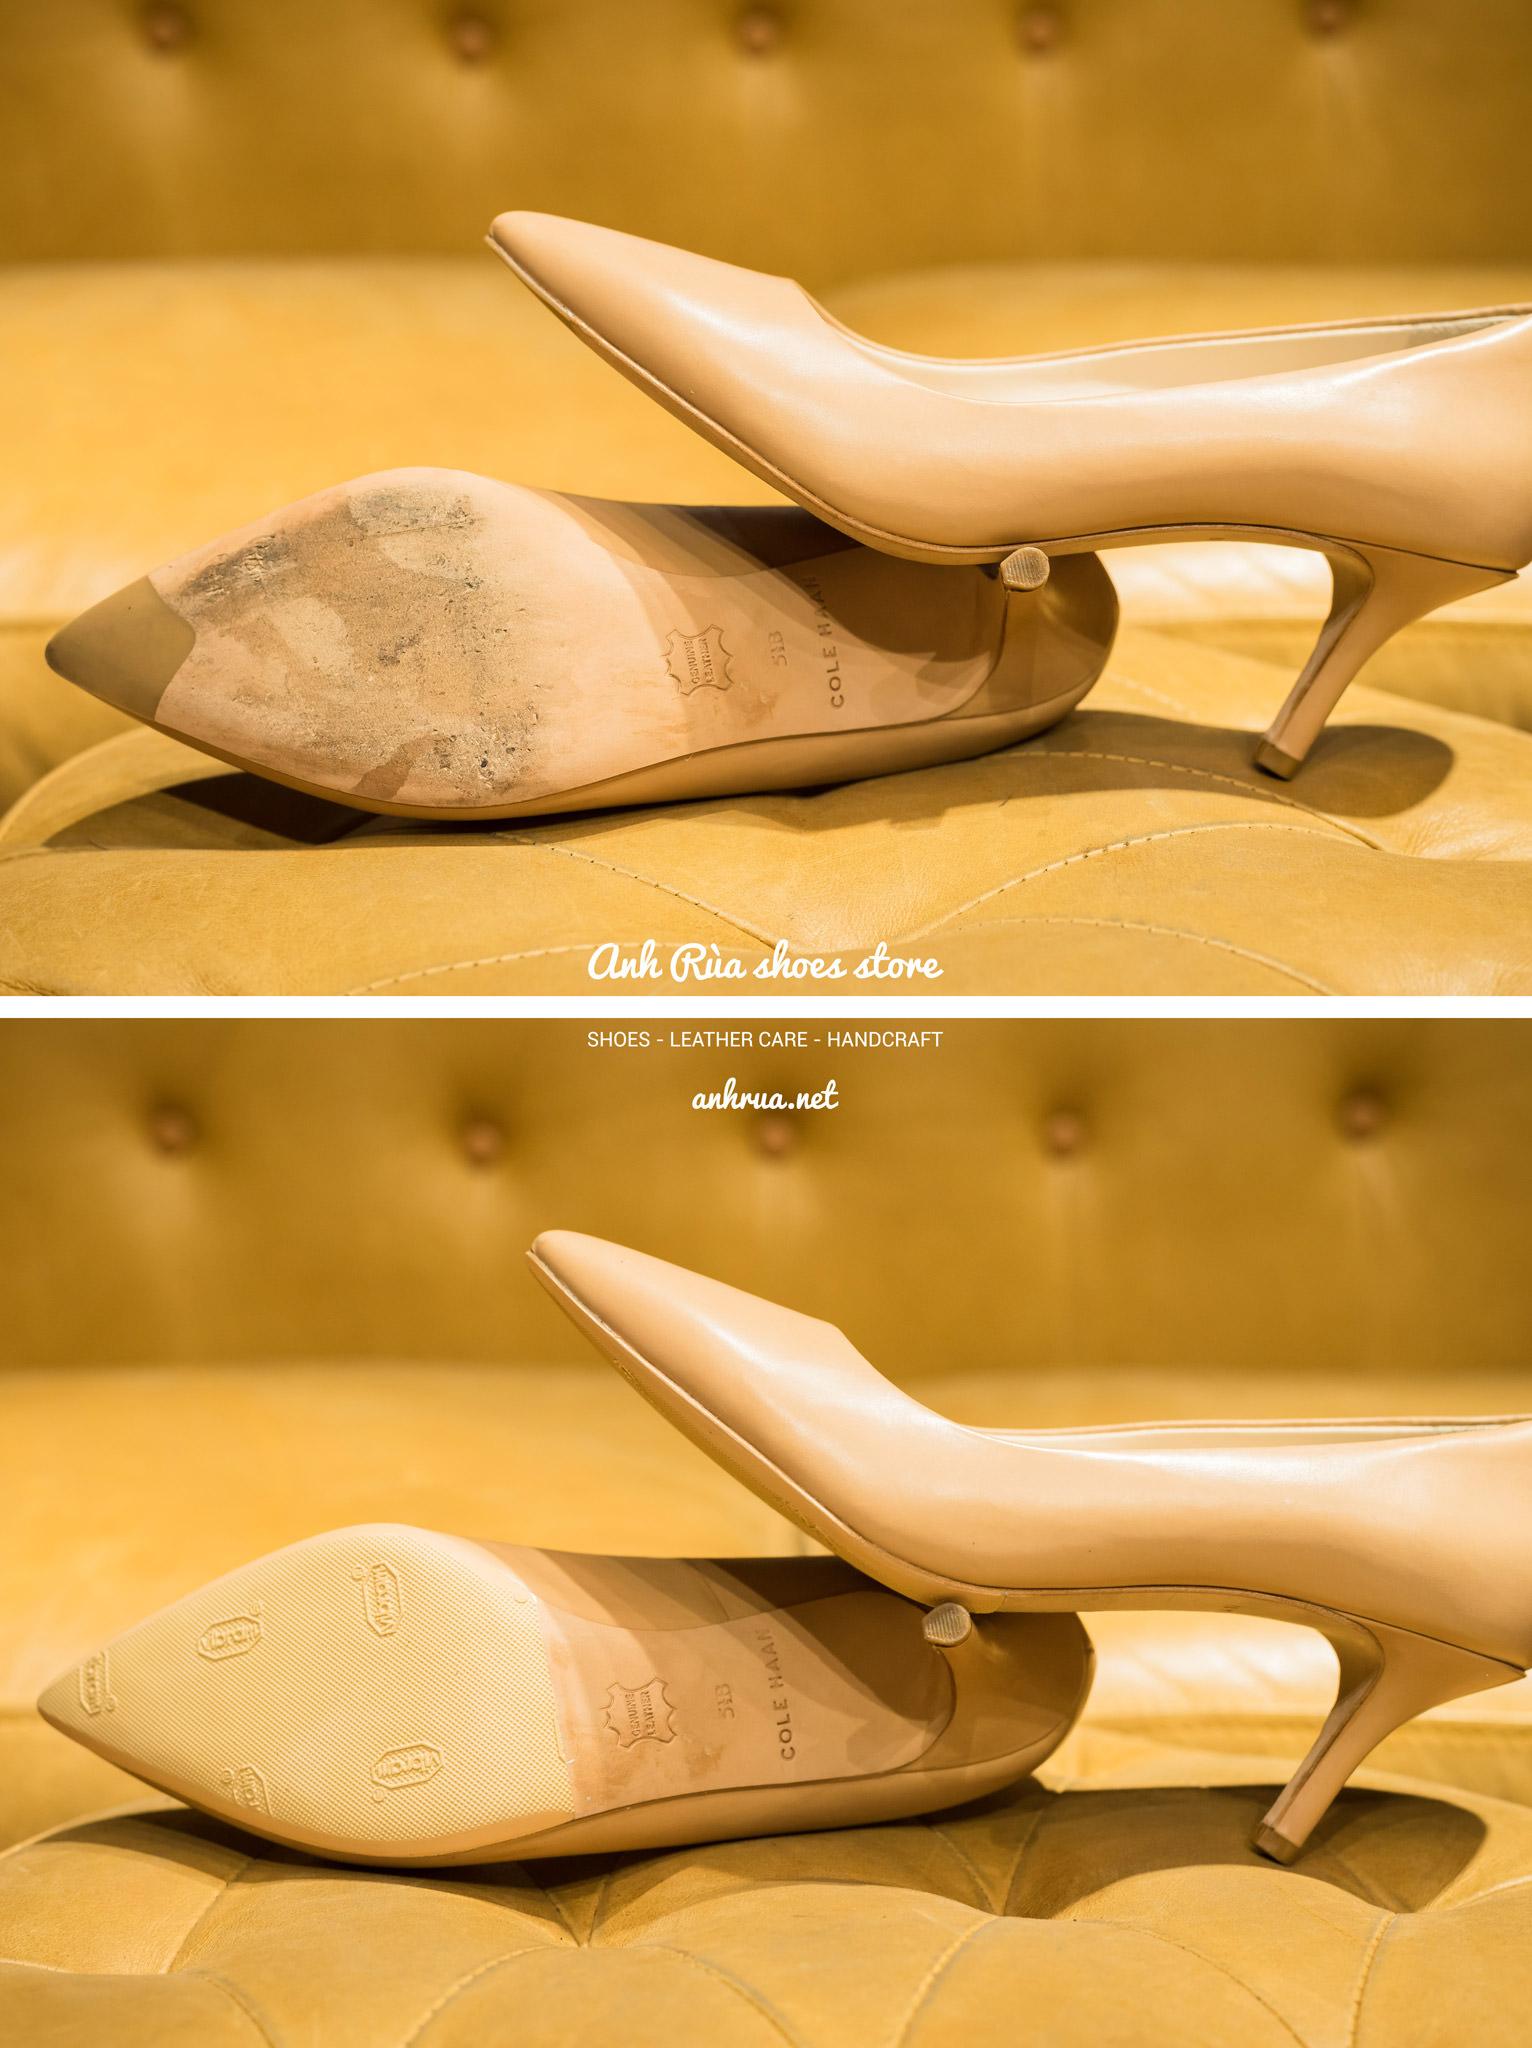 Dán đế giày Vibram trước kem